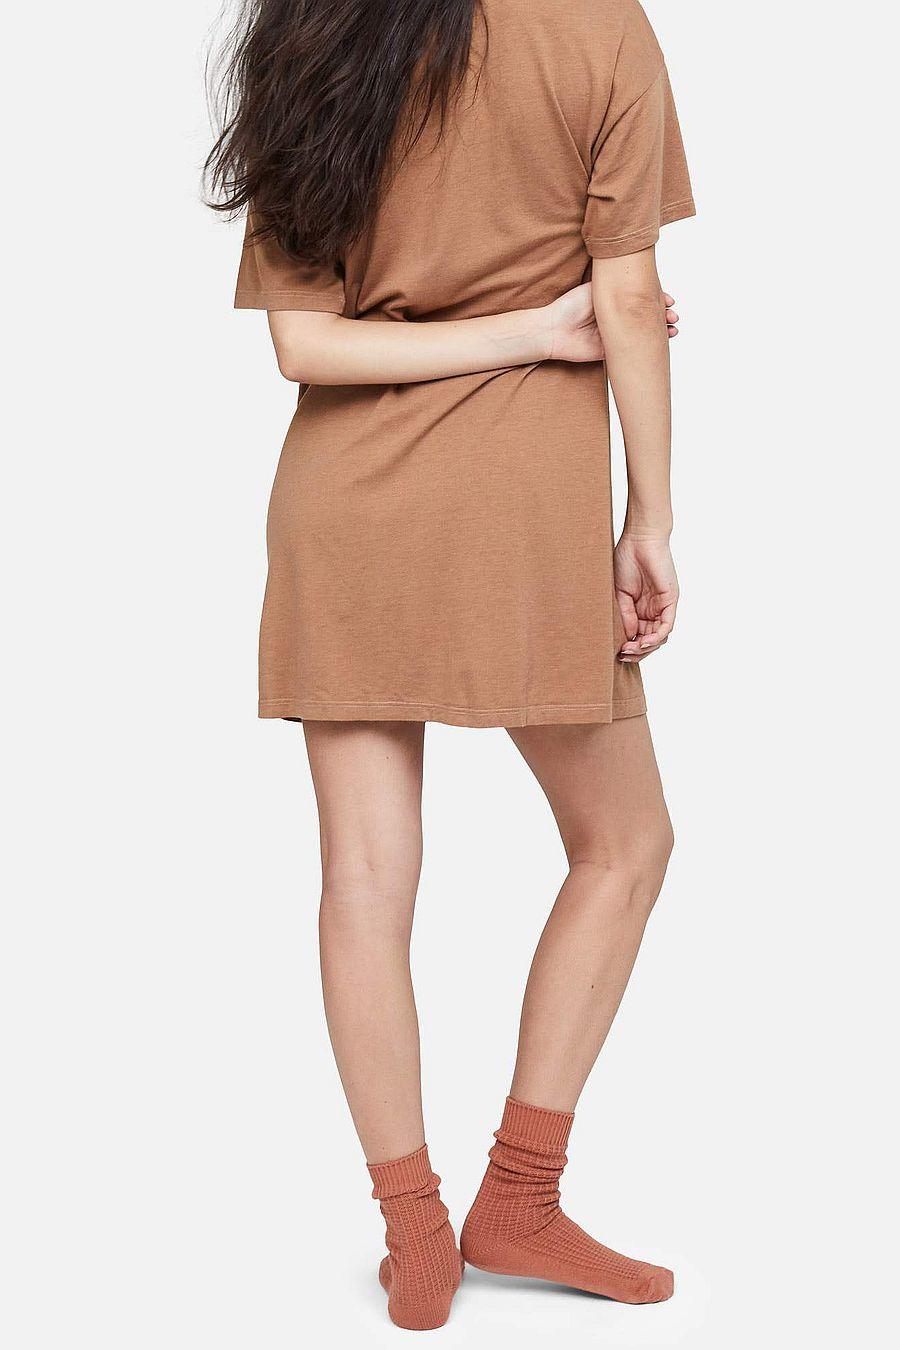 MATE The Label Tencel Sleep Tee Dress - SEDONA